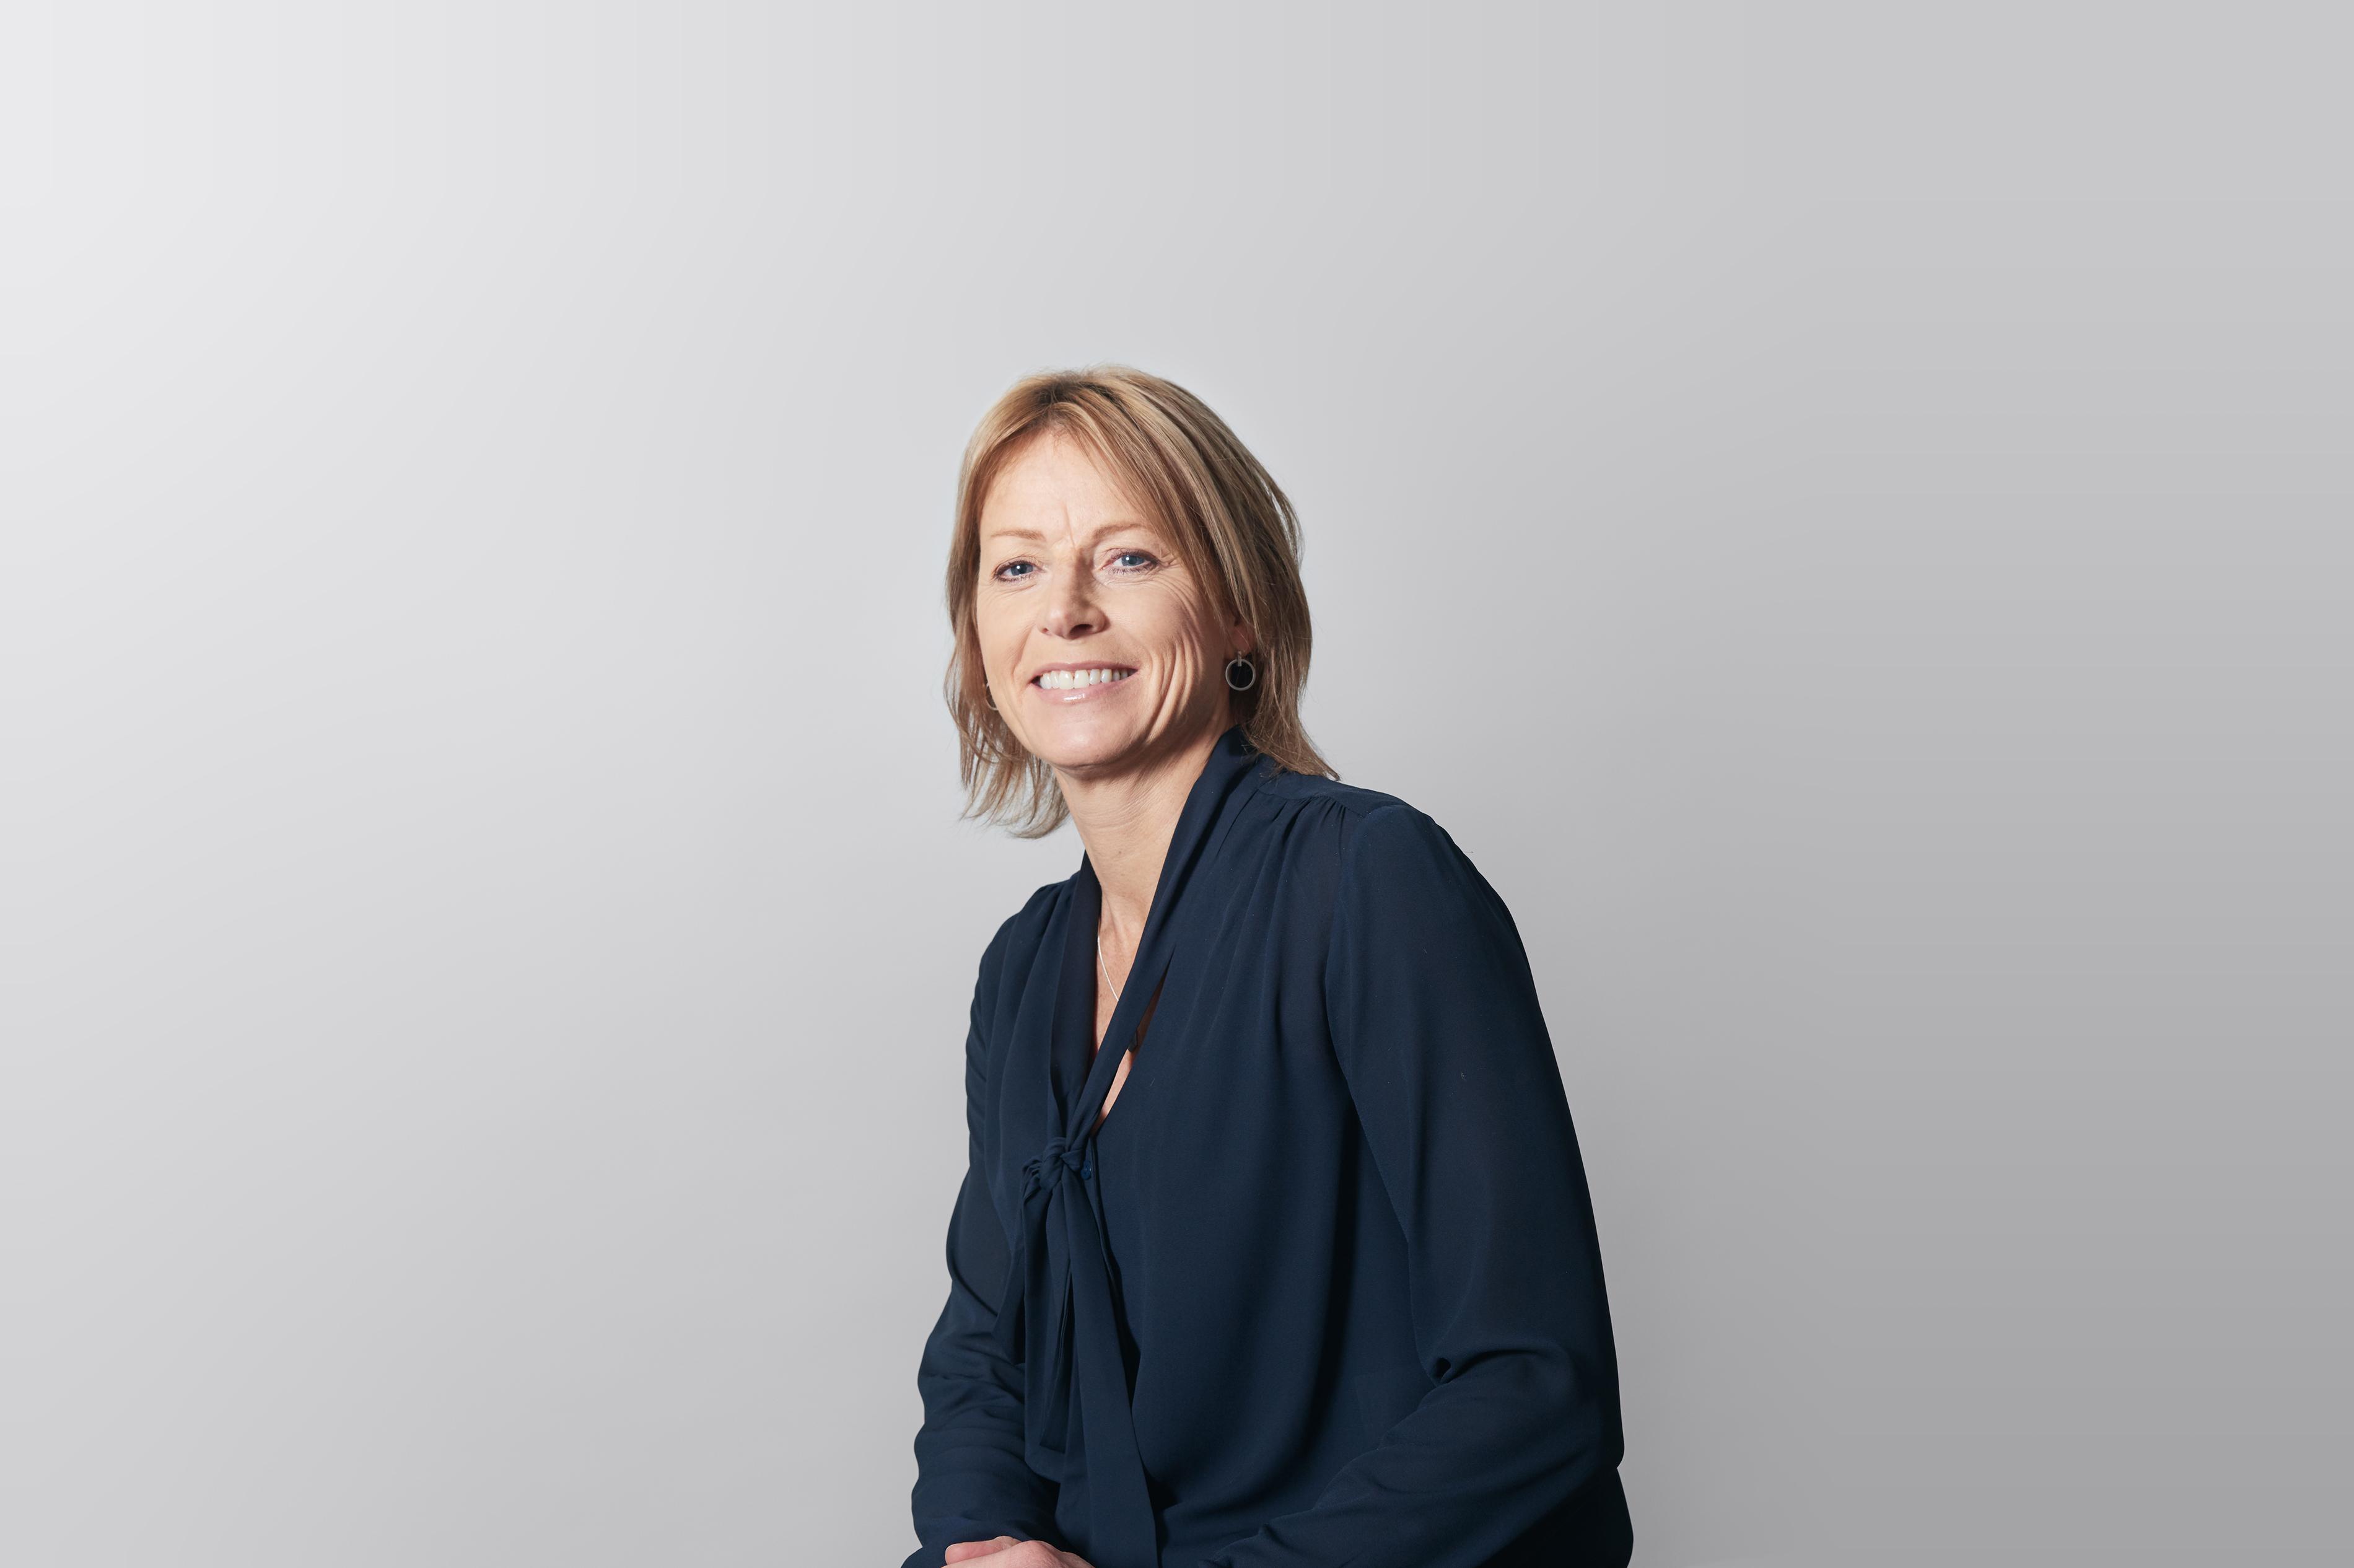 Sheila Florell